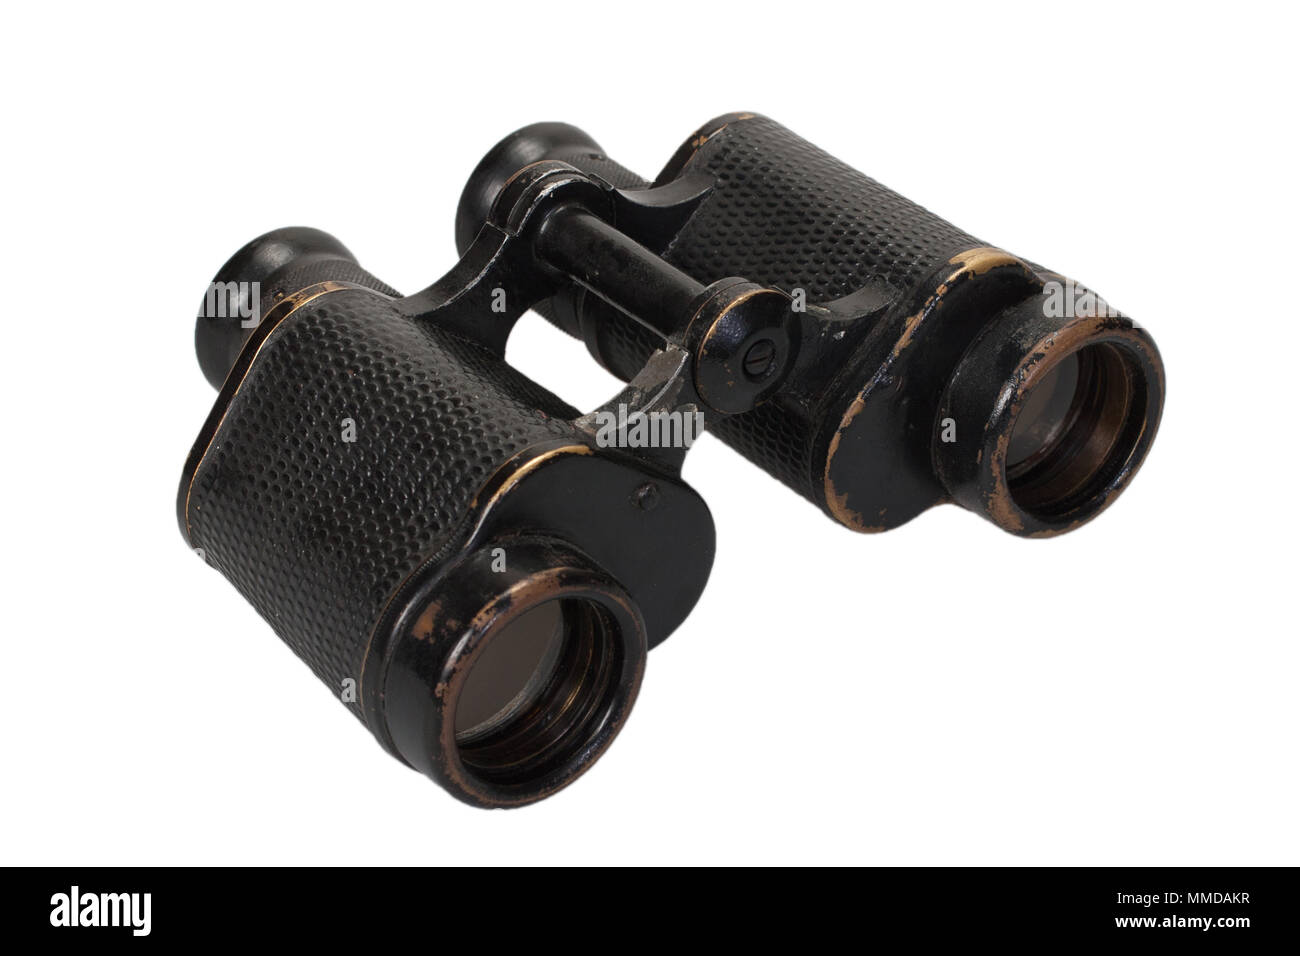 ww2 period binoculars on white background - Stock Image